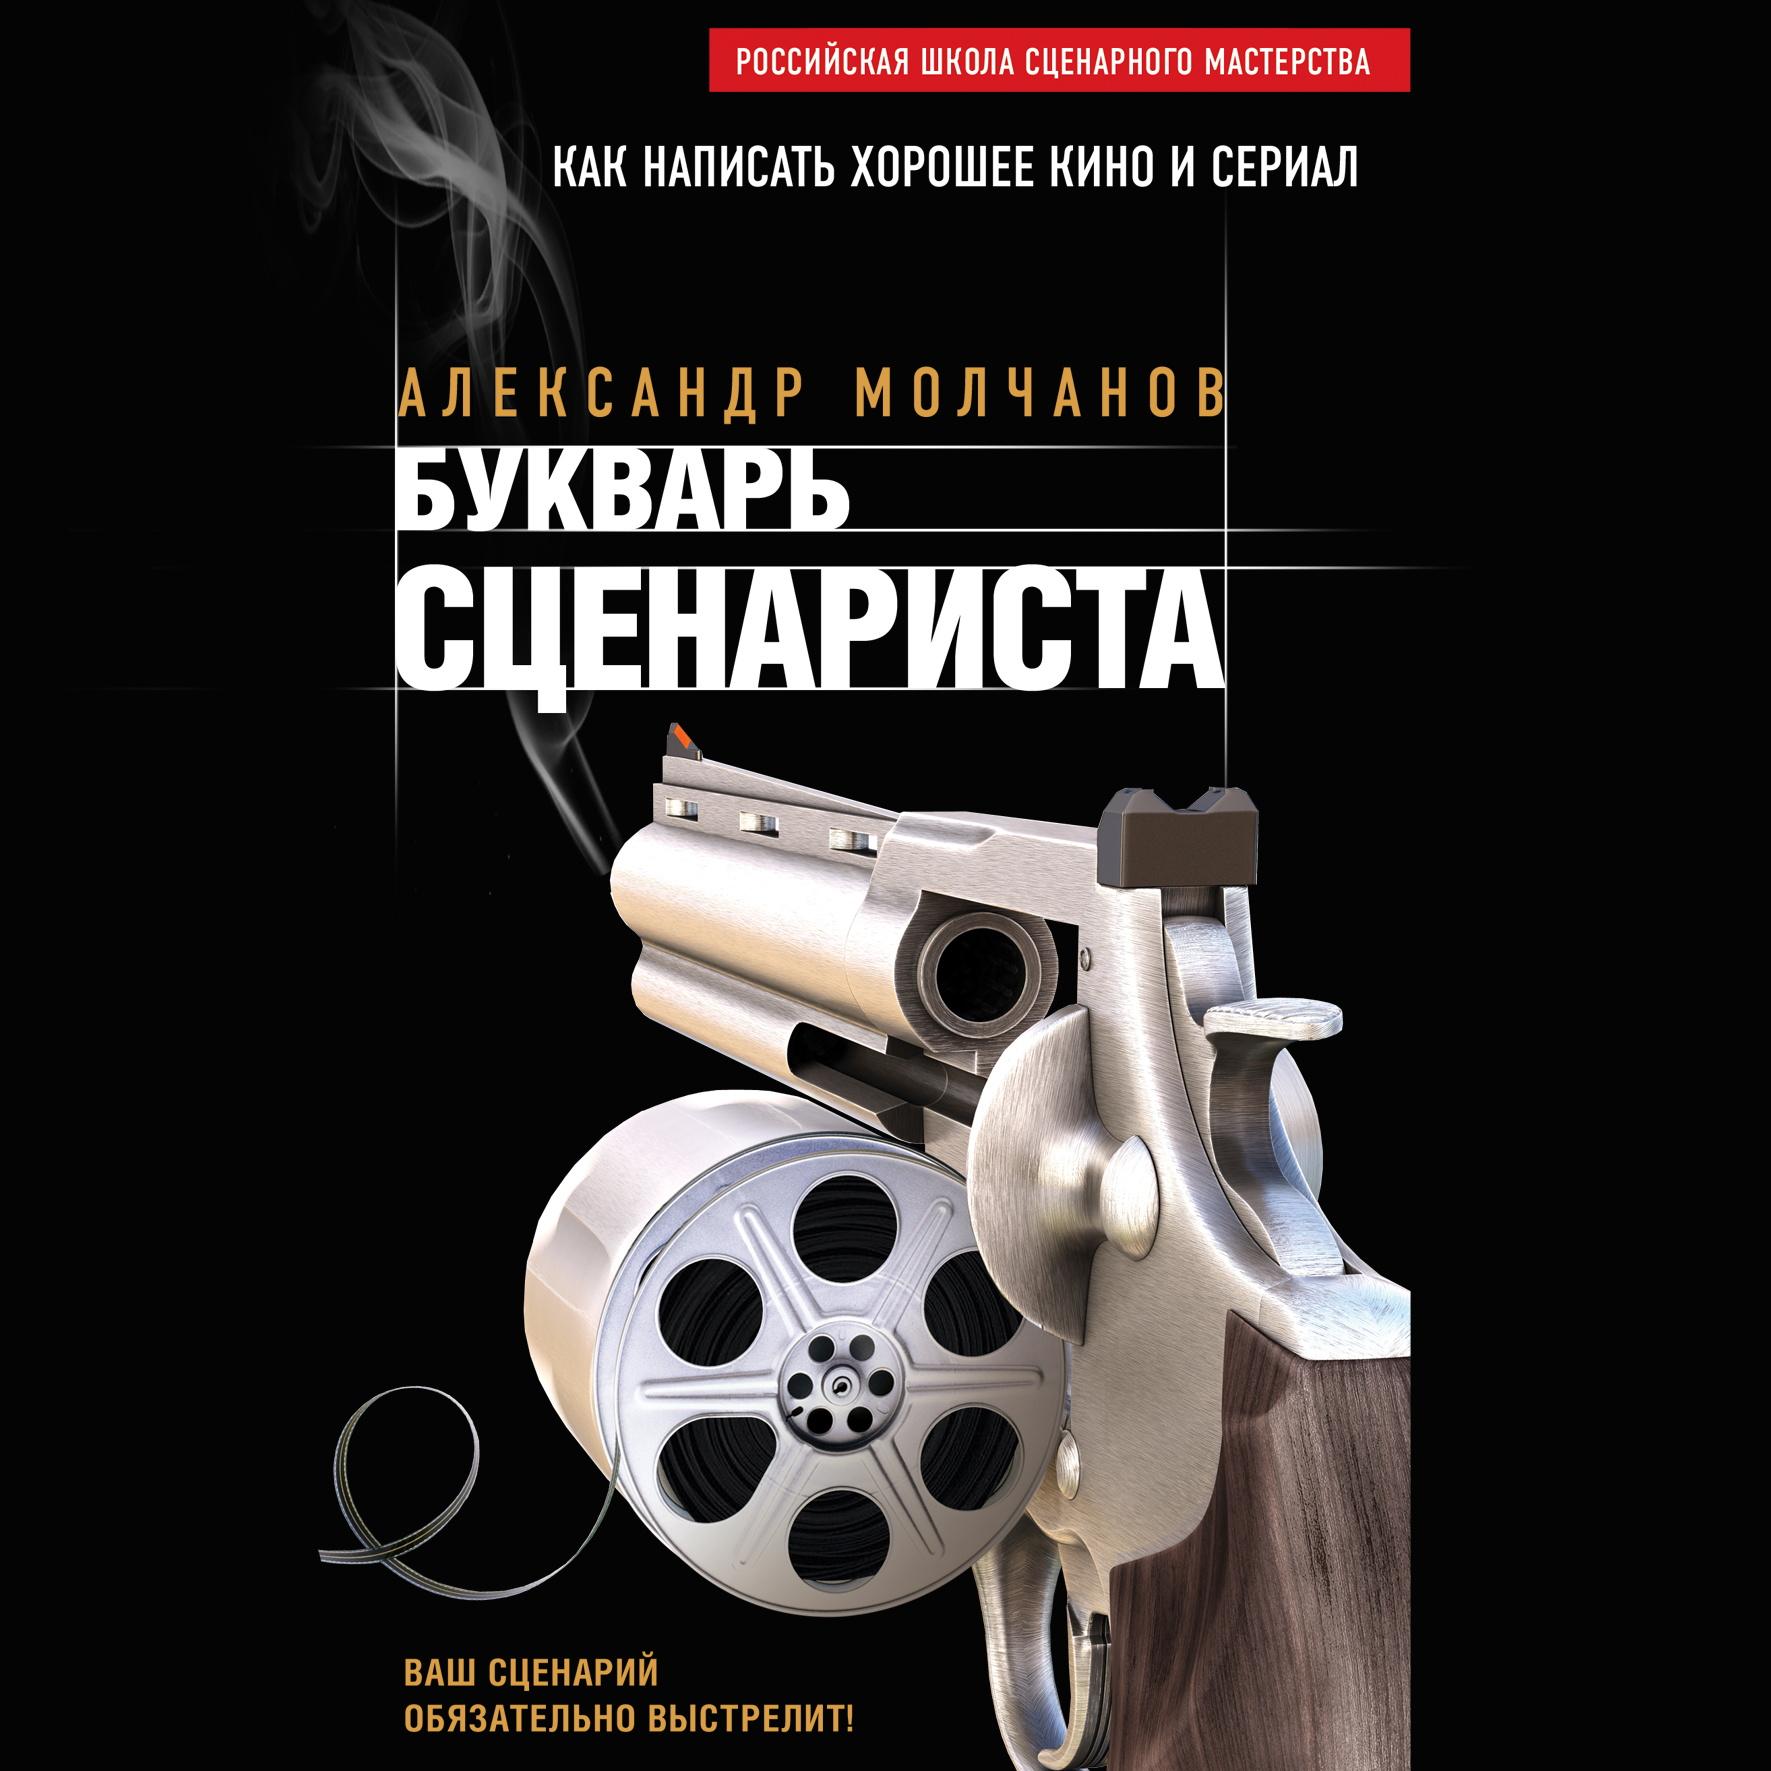 цена Александр Молчанов Букварь сценариста в интернет-магазинах